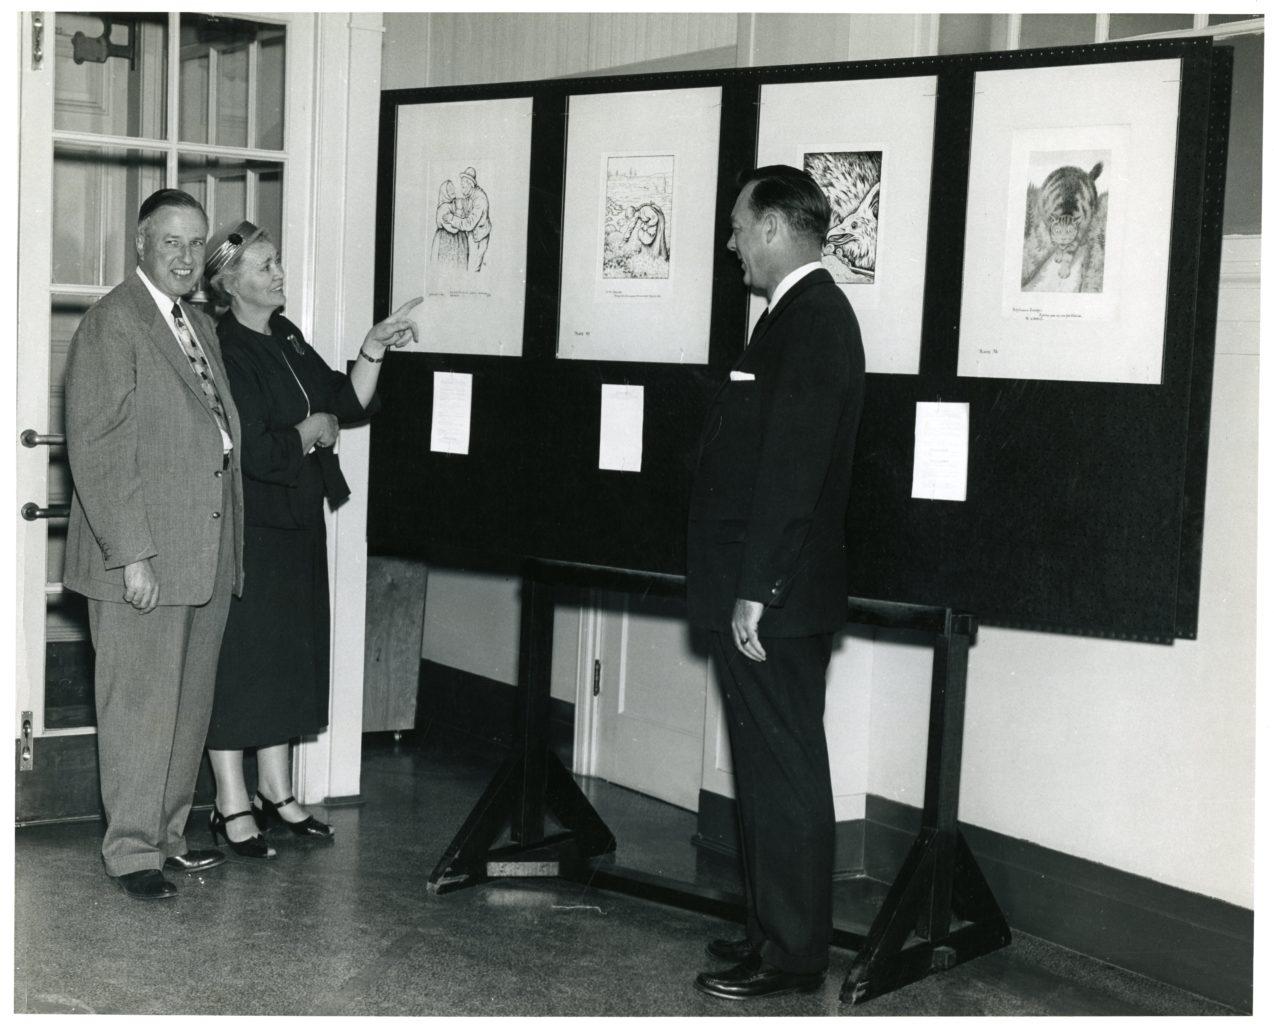 Three individuals look at the Kittelsen exhibit.